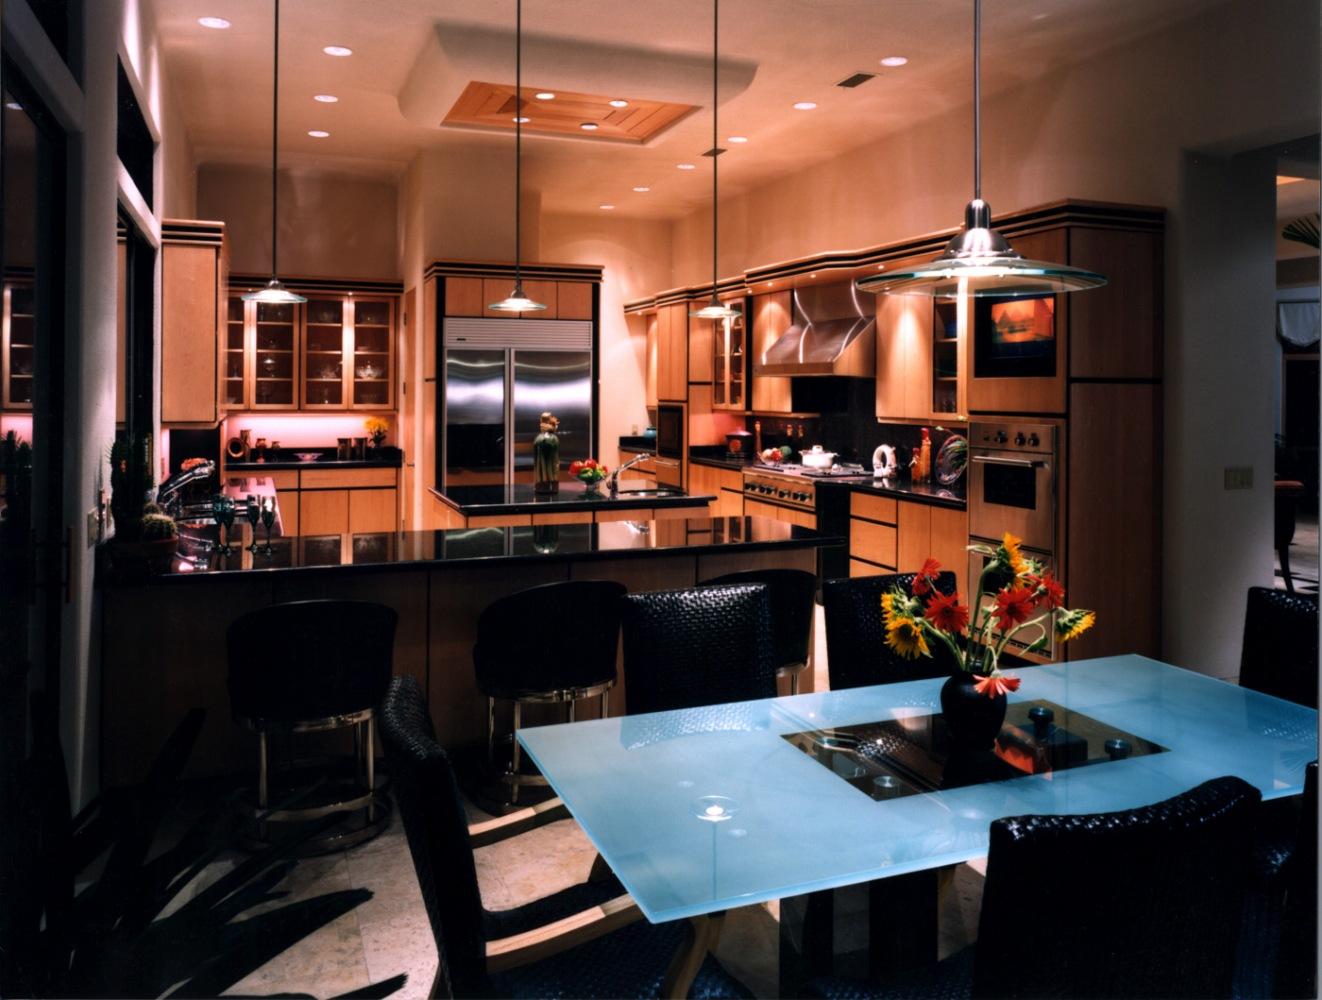 5500-Isleworth-Country-Club-Drive-Breakfast-Room-7.jpg